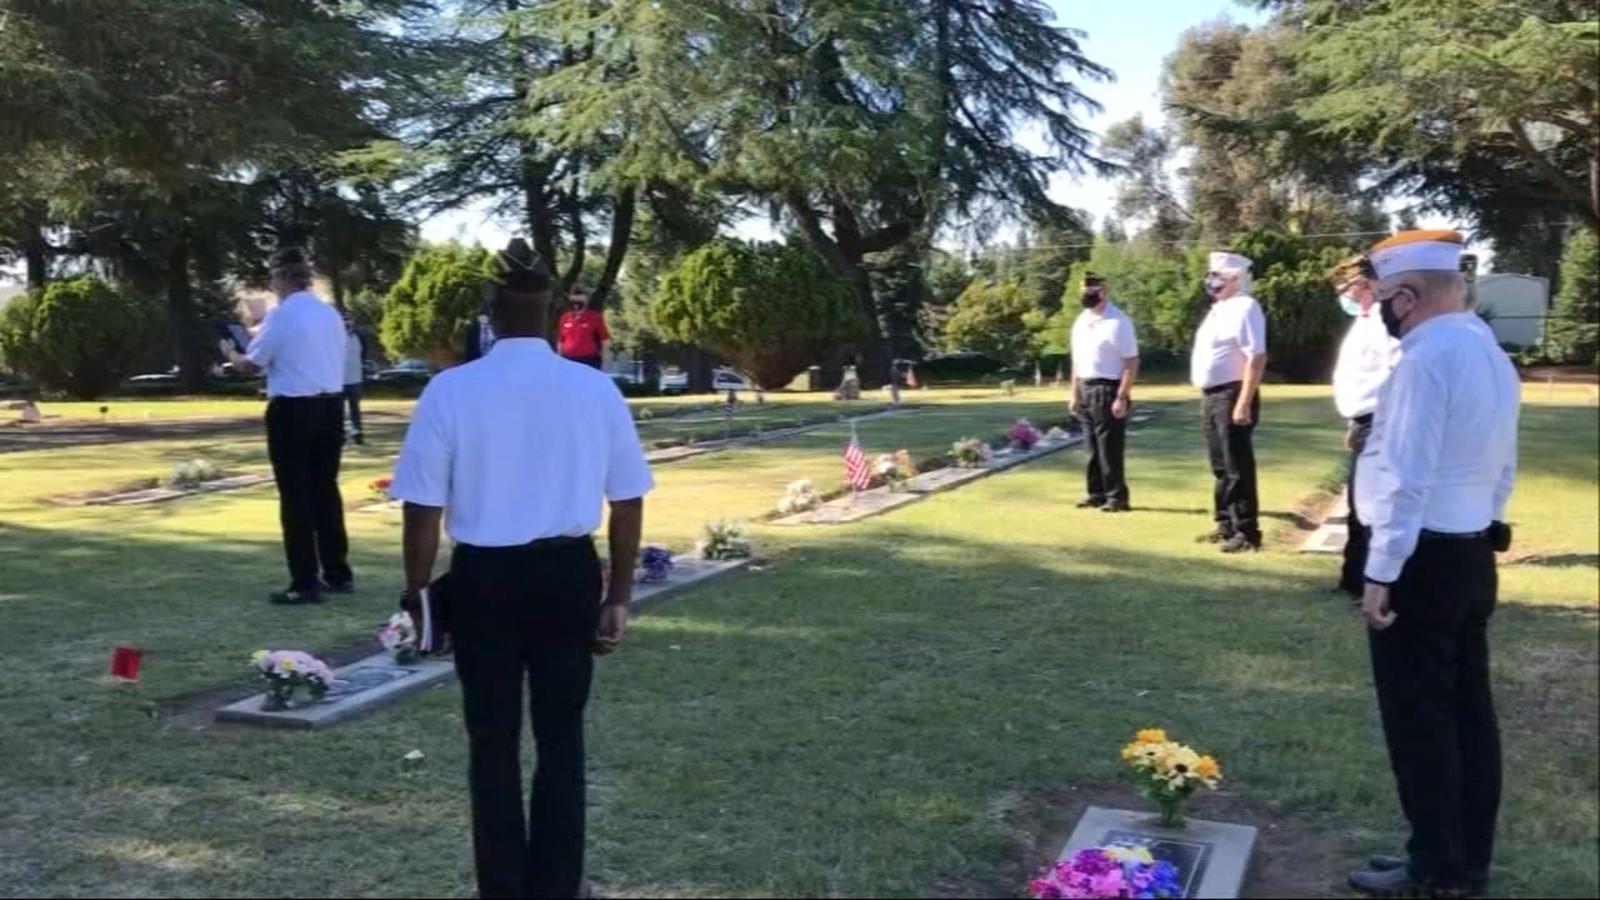 Coronavirus forces creativity in Memorial Day tributes